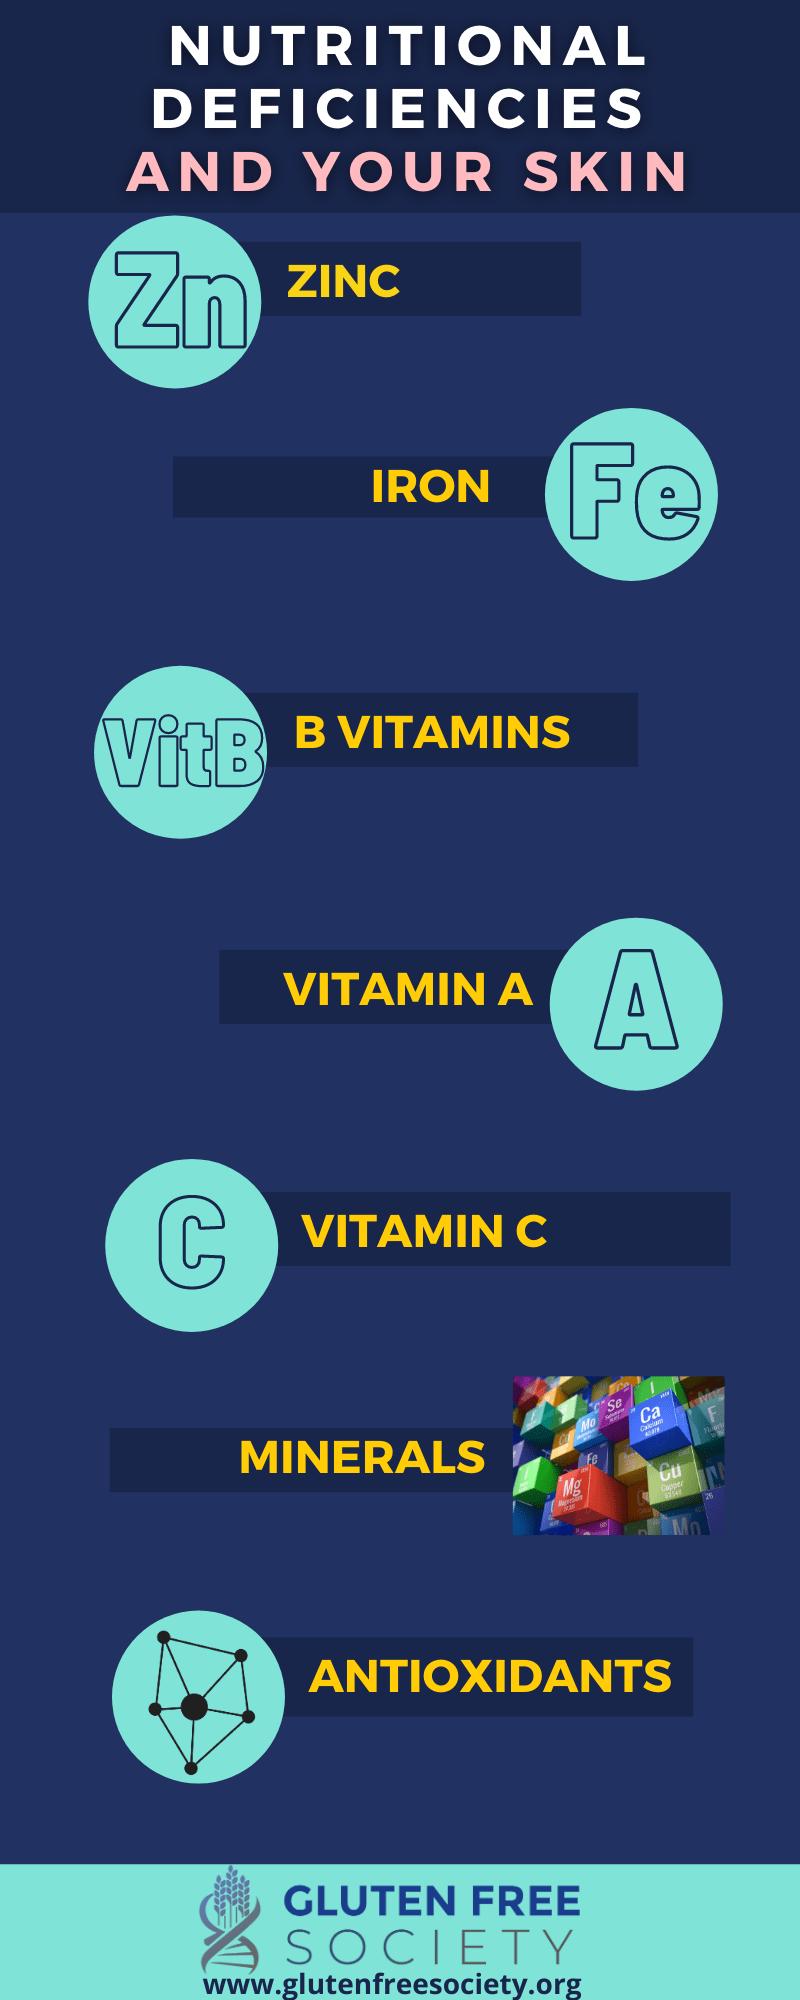 vitamins, gluten, and skin health